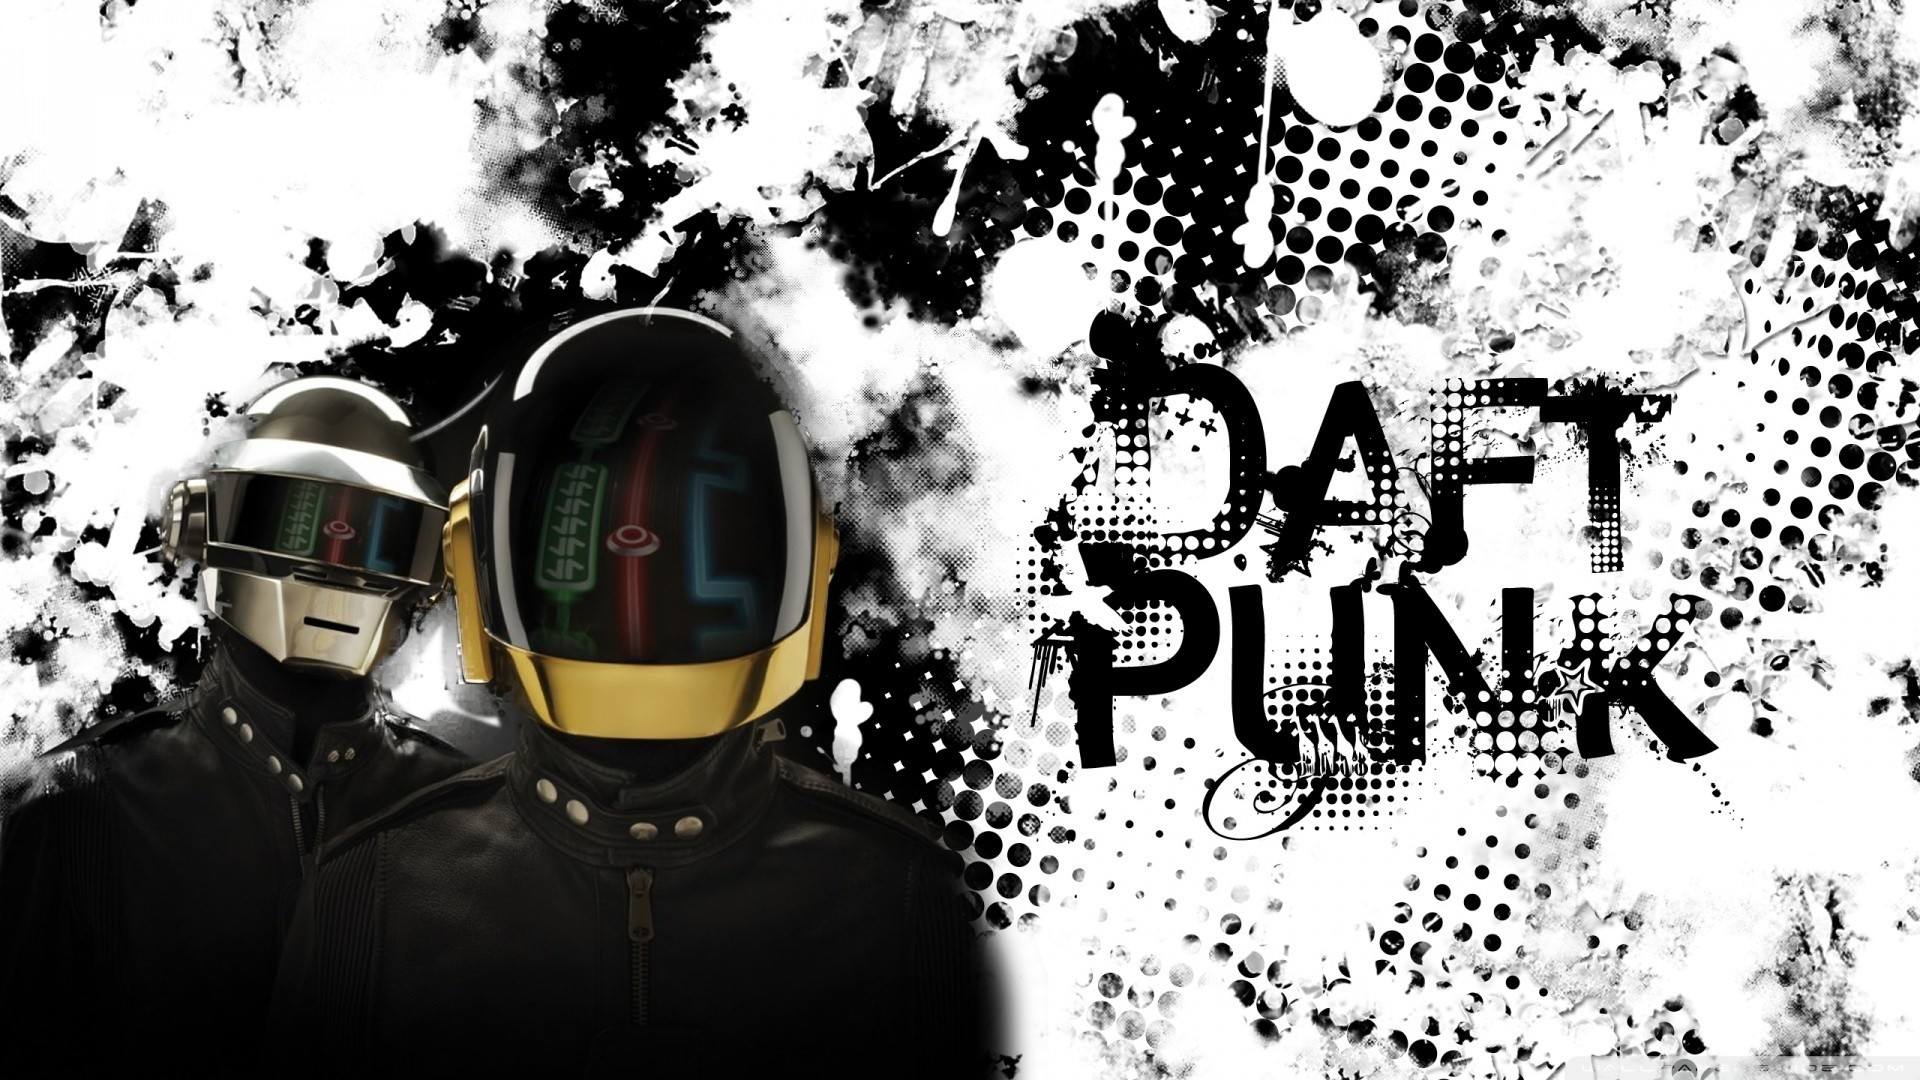 Daft Punk Wallpaper for pc